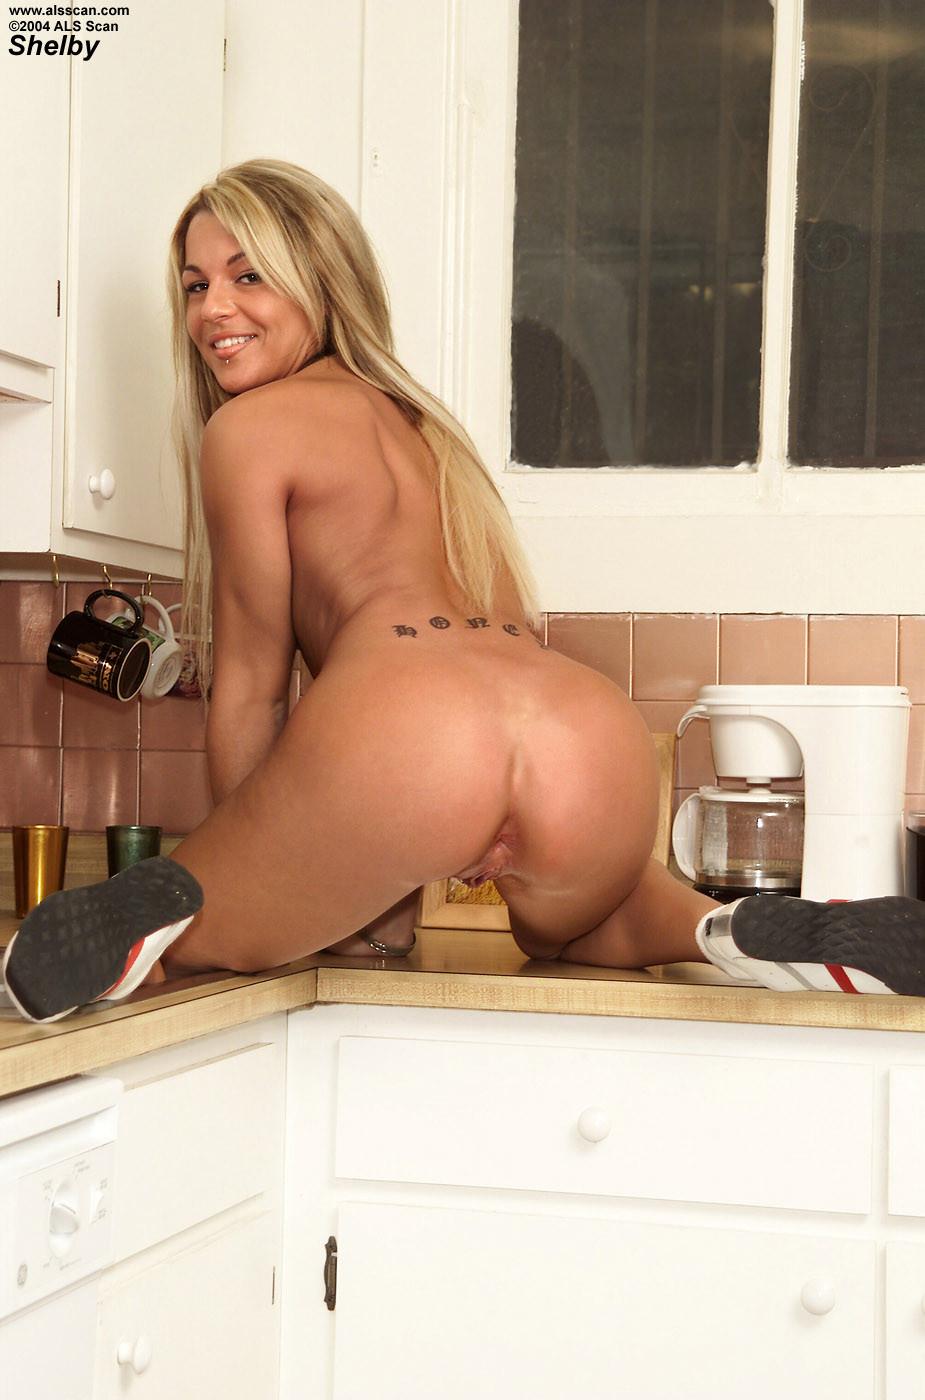 Shelbee Myne - На кухне - Галерея № 2362519